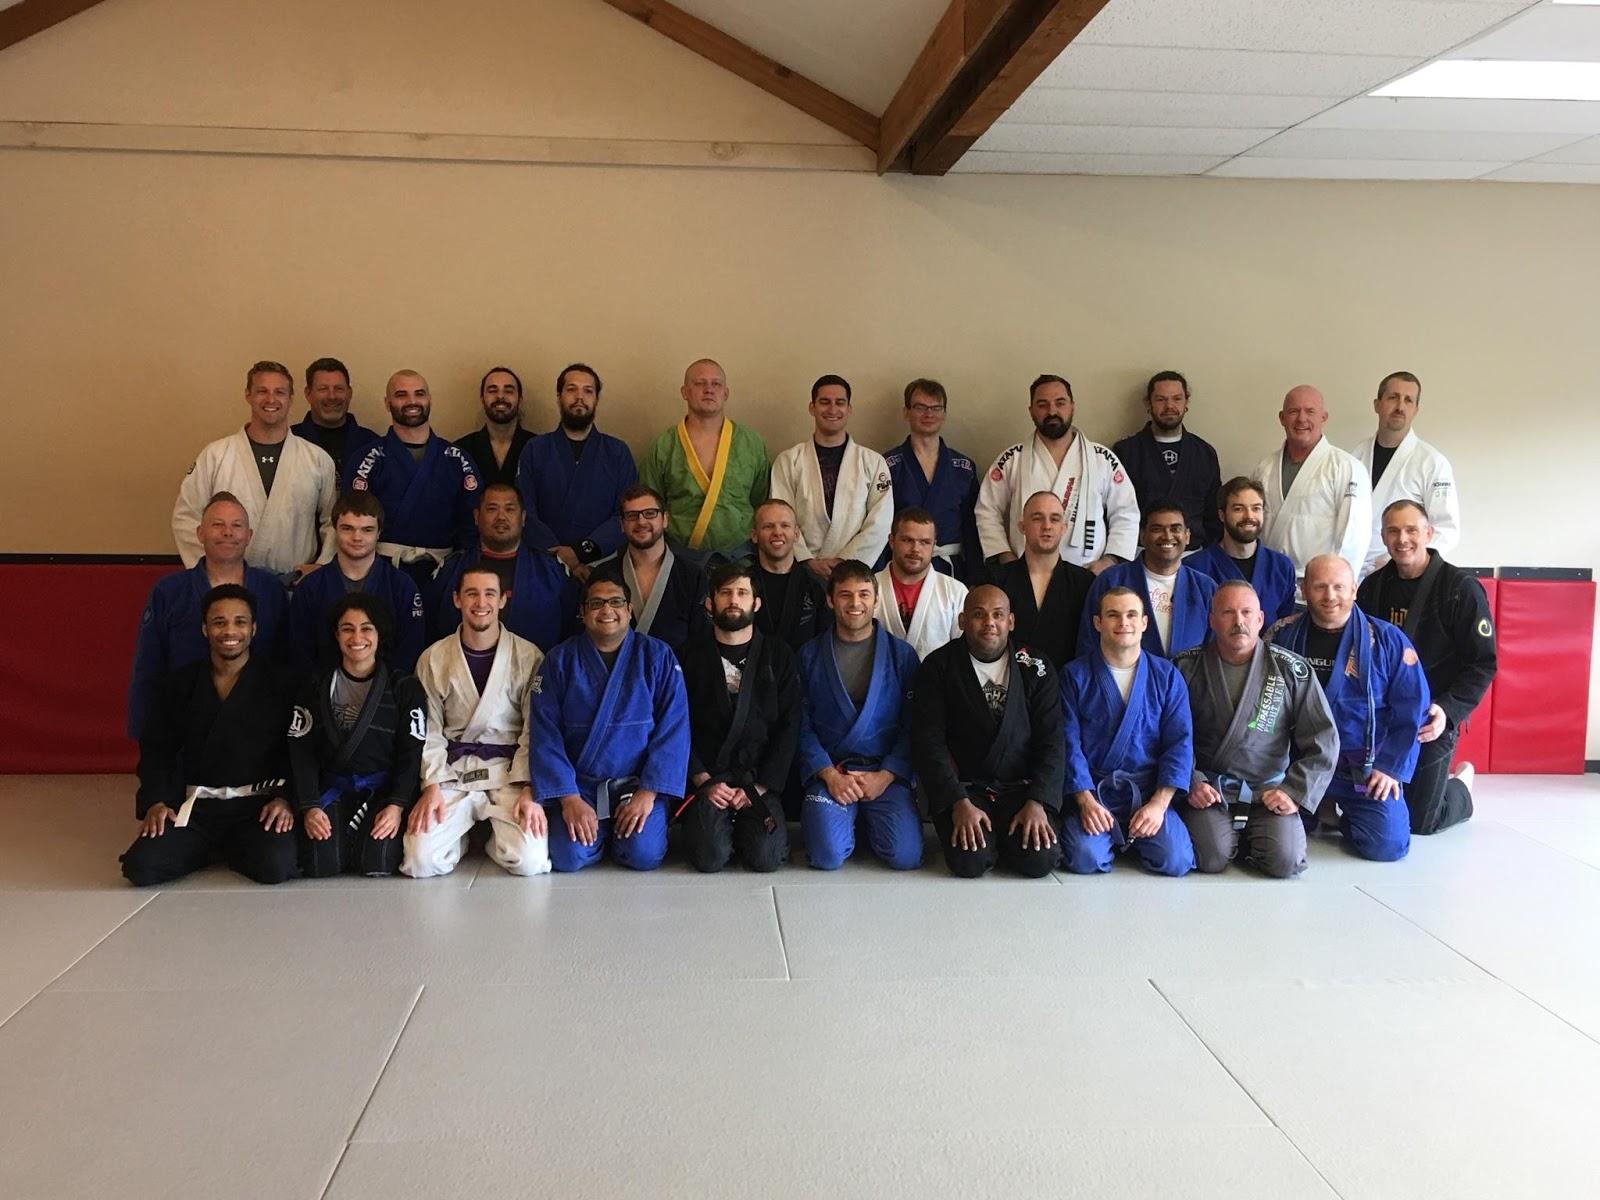 Josh's Jiu-Jitsu Journal: May 2017